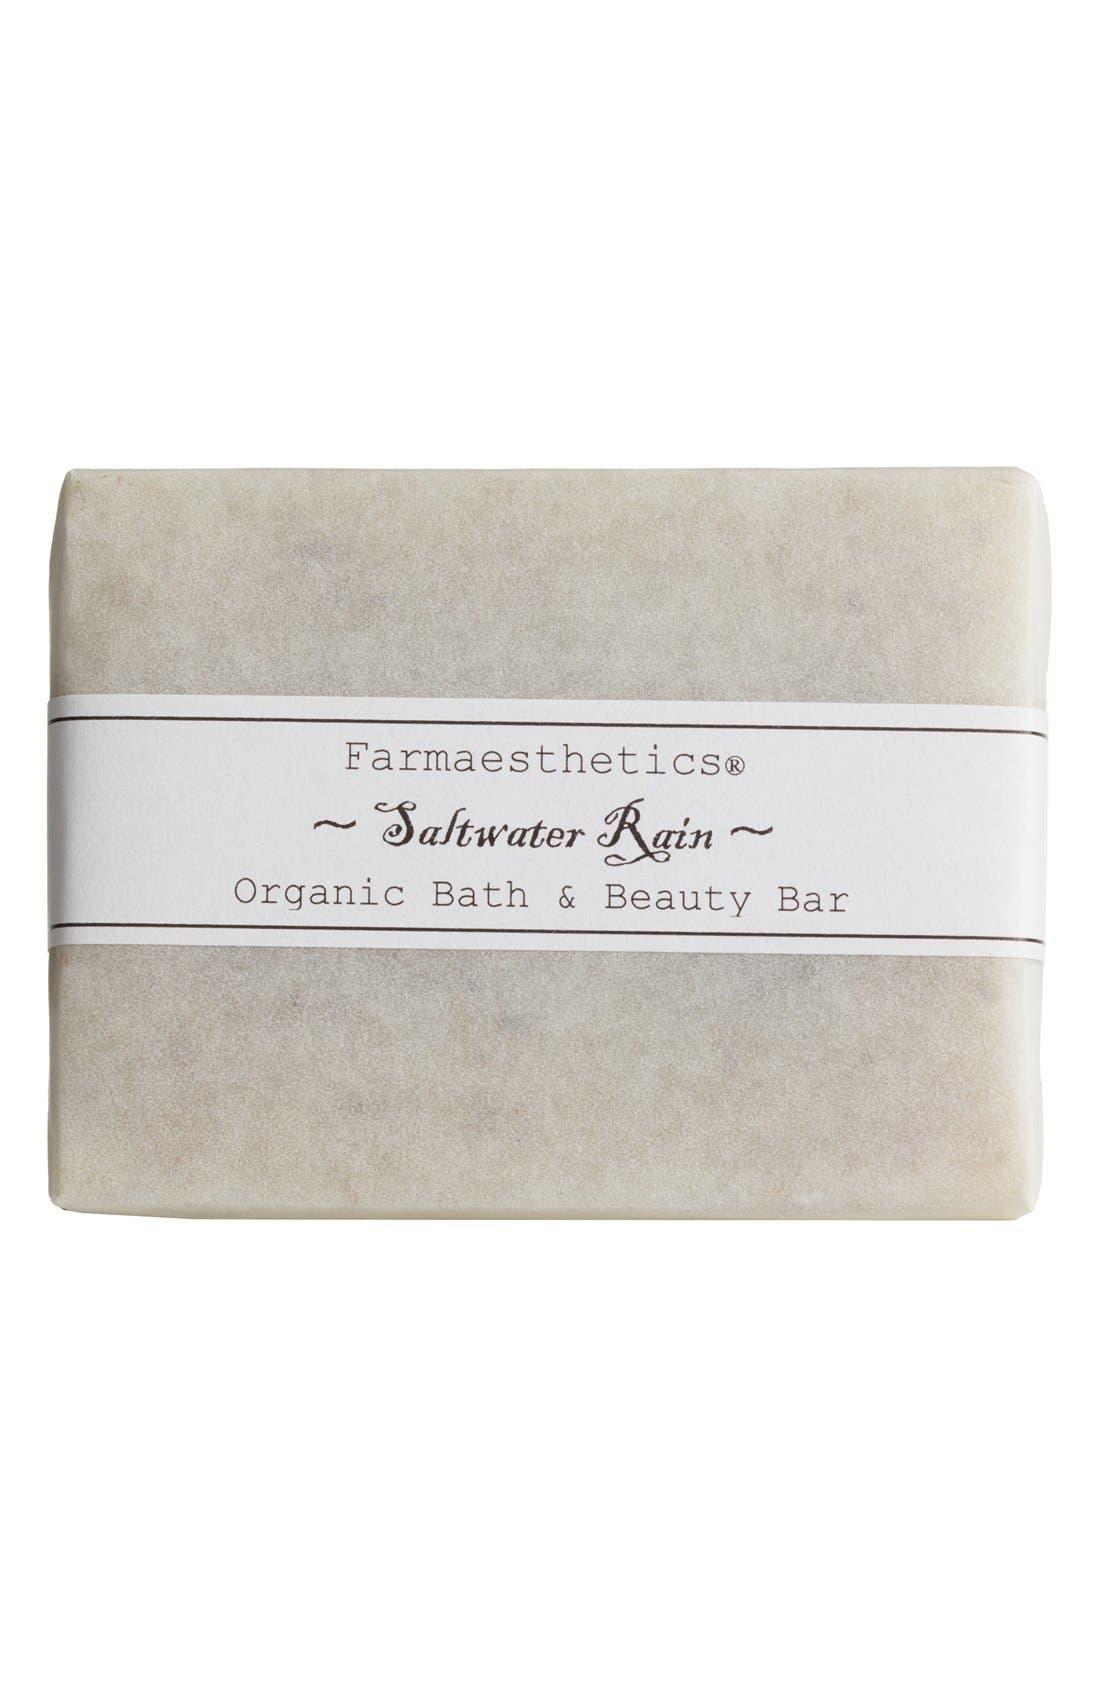 Farmaesthetics Saltwater Rain Bath & Beauty Bar